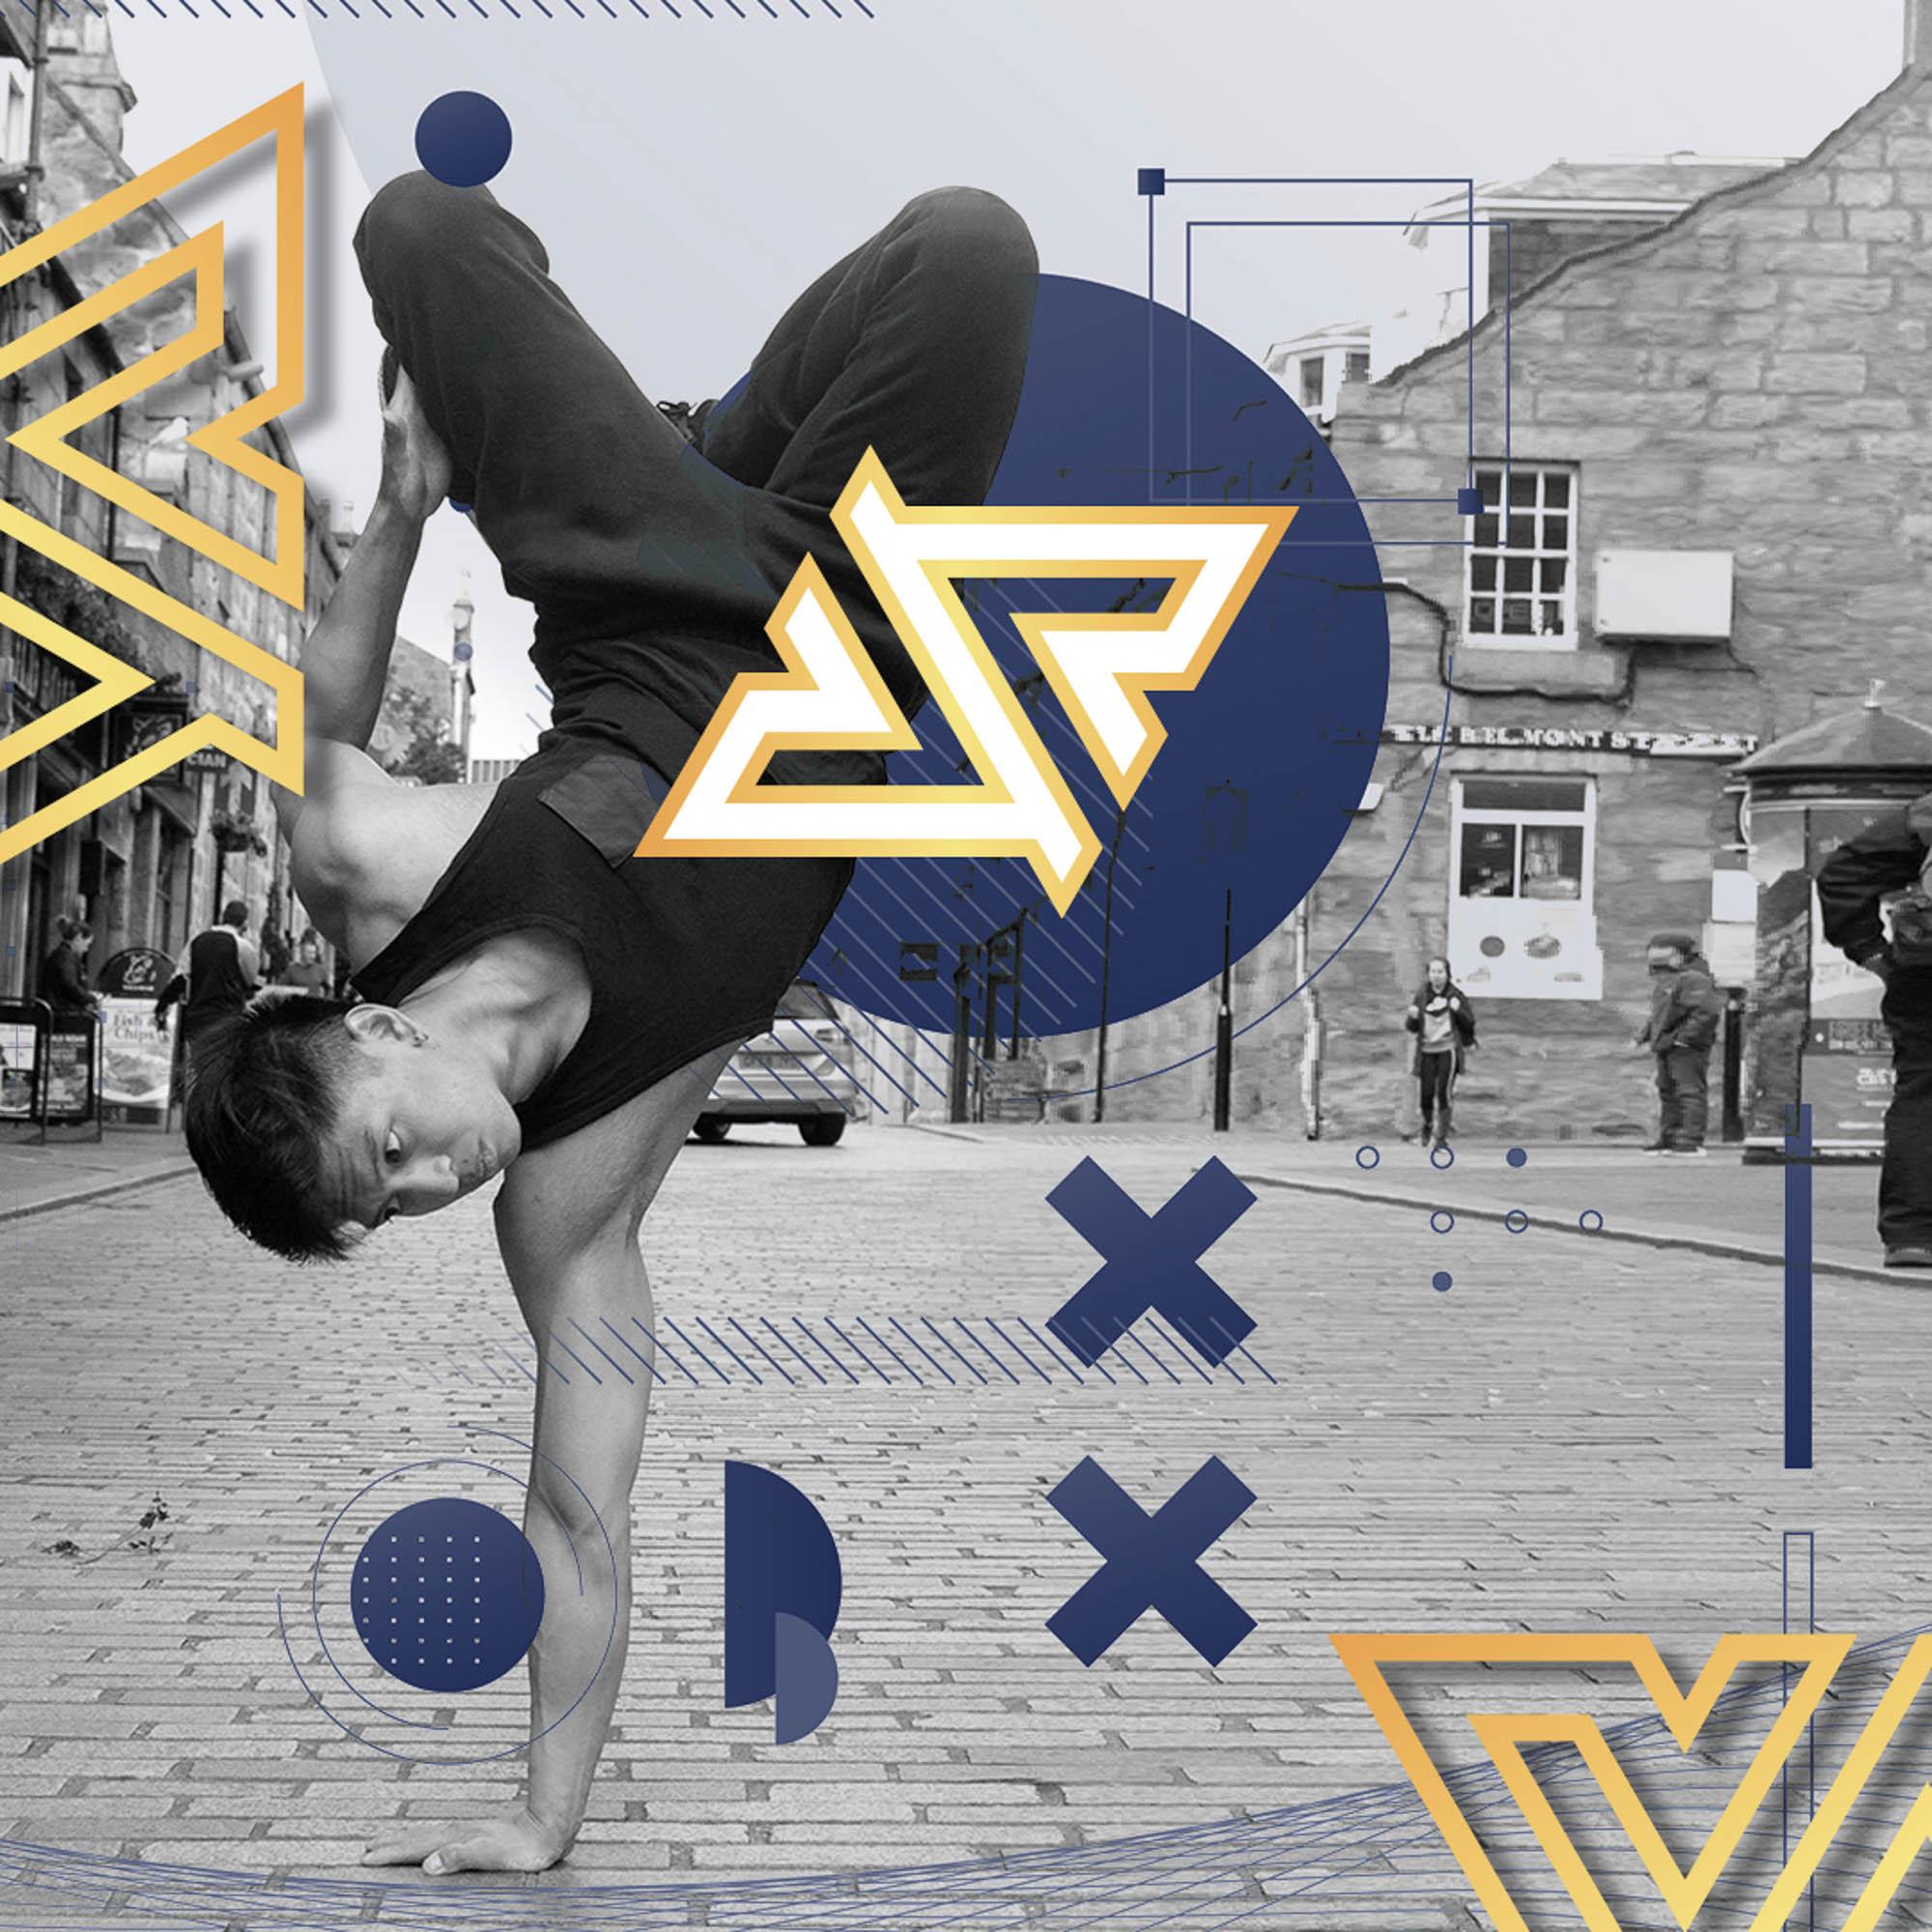 Royal Five - Breakdance